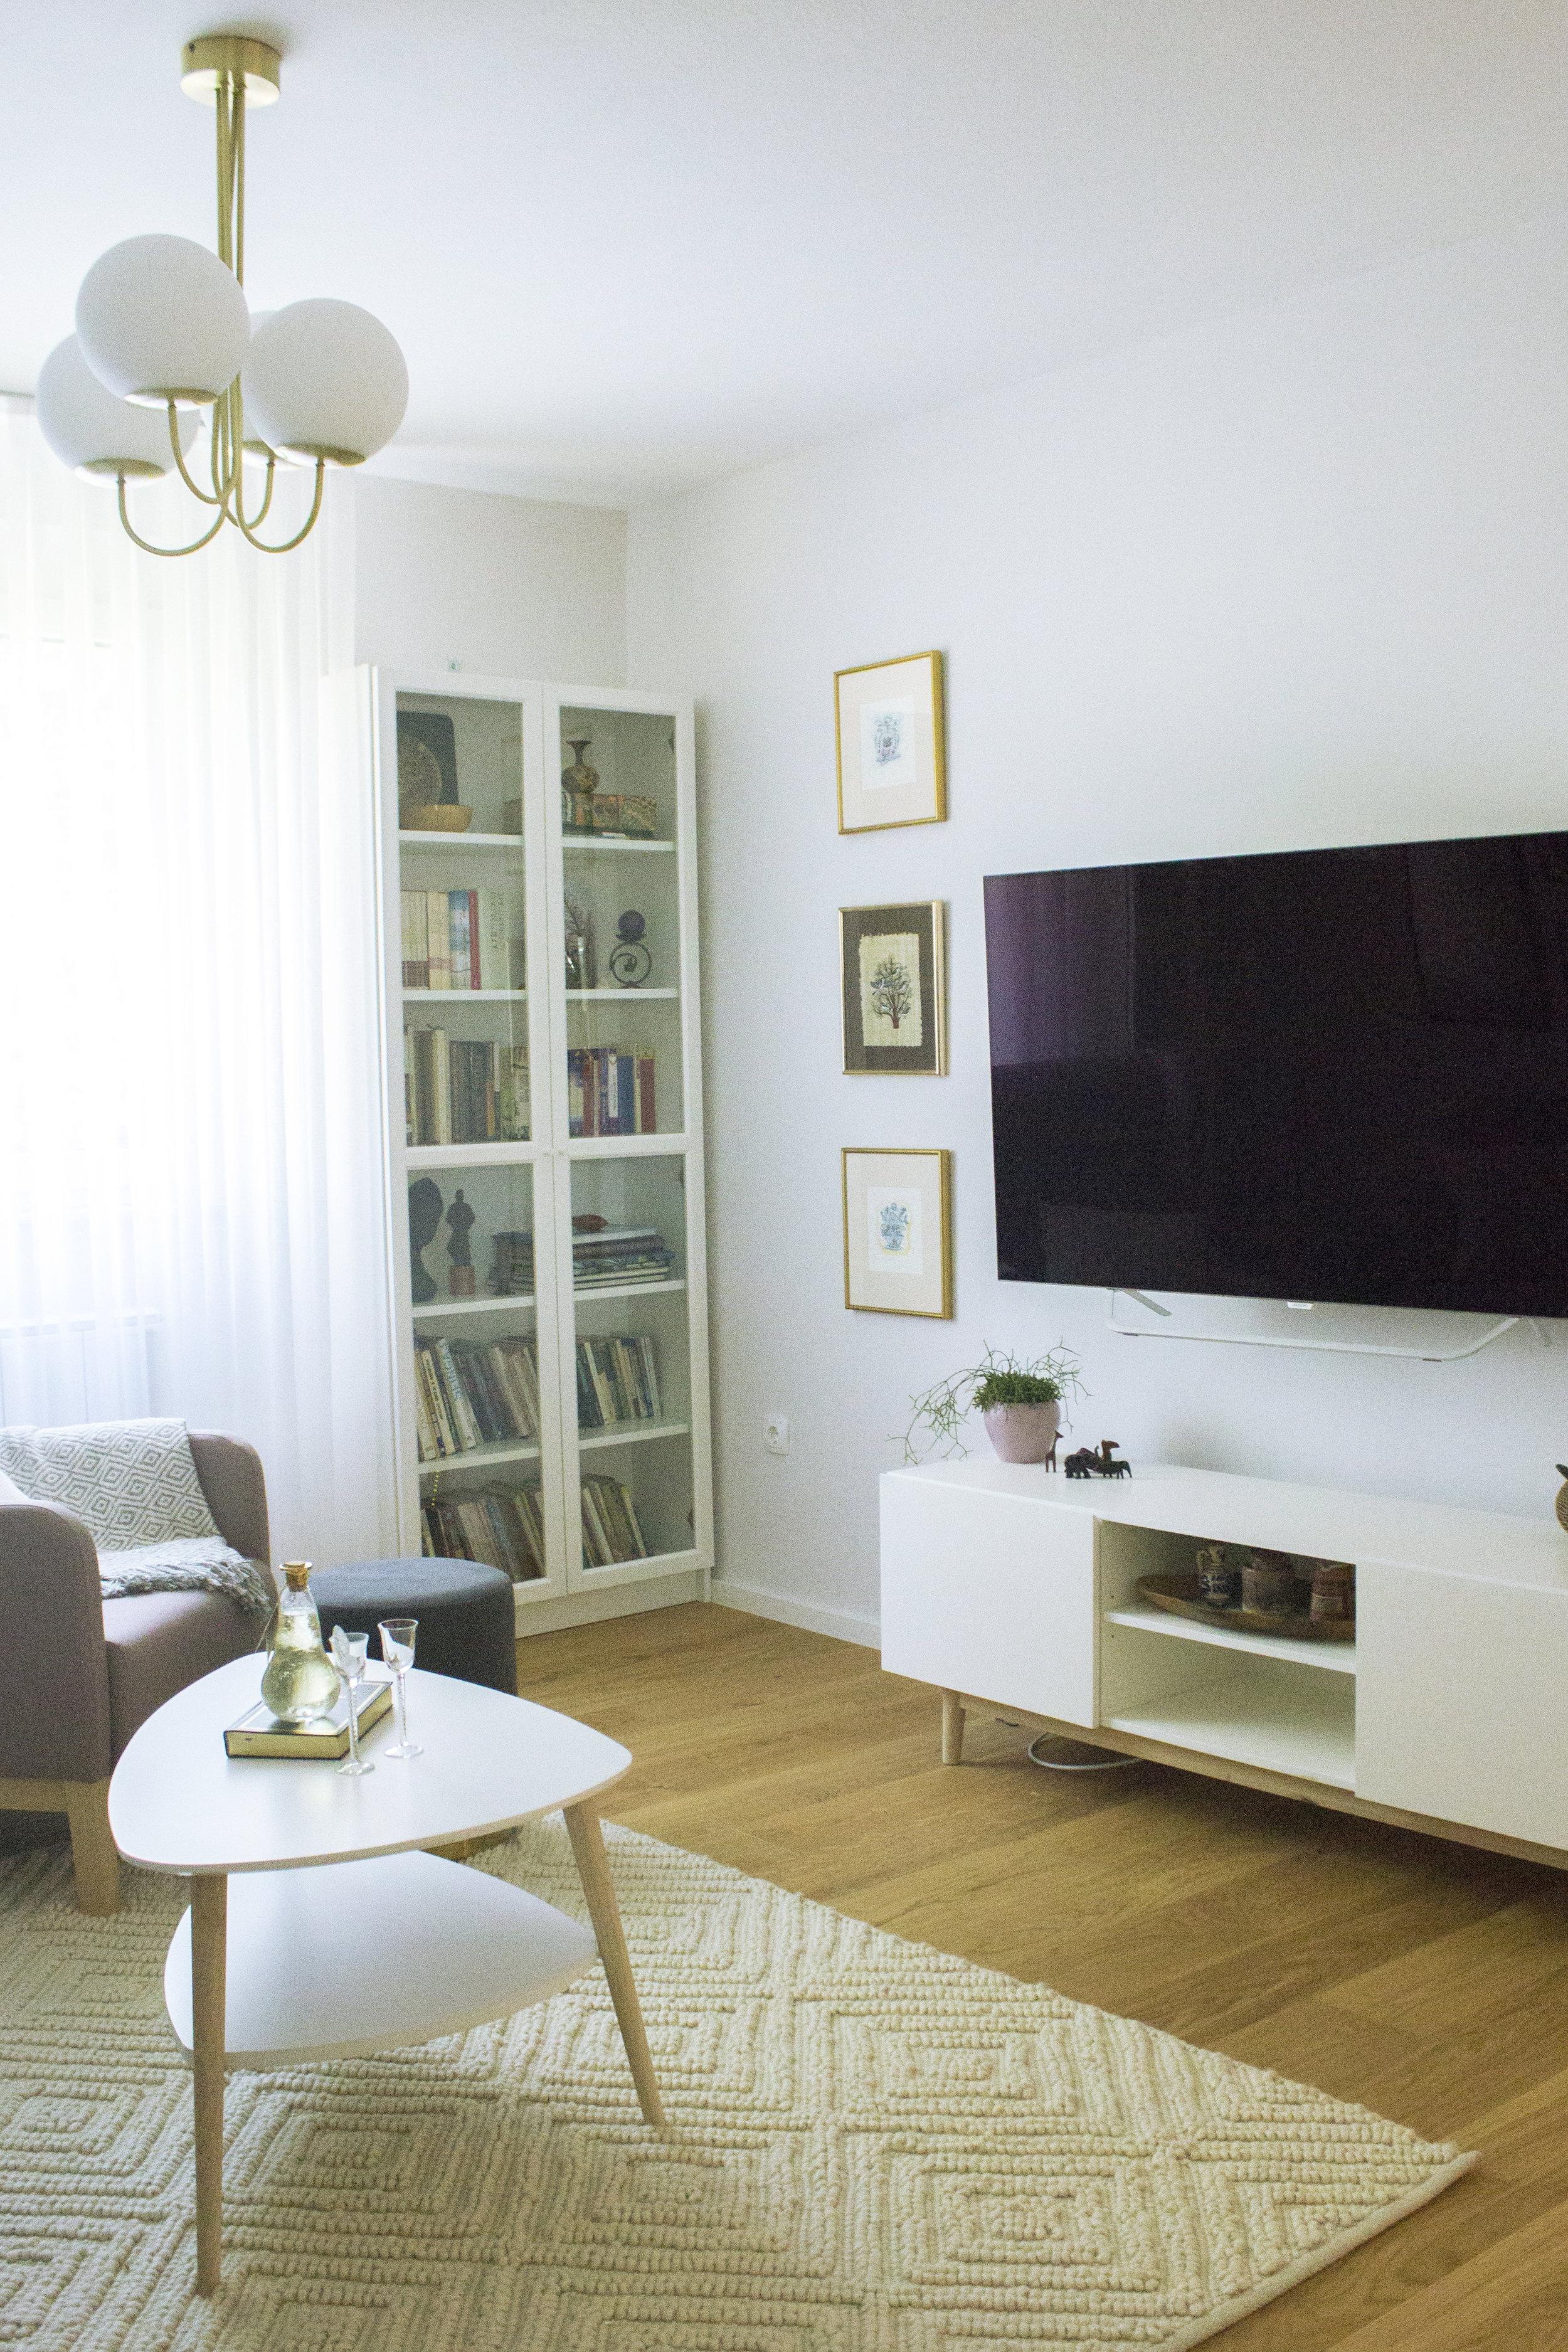 poke_dnevnasoba_livingroom_interiordesign_bolikovanjeinterijerja